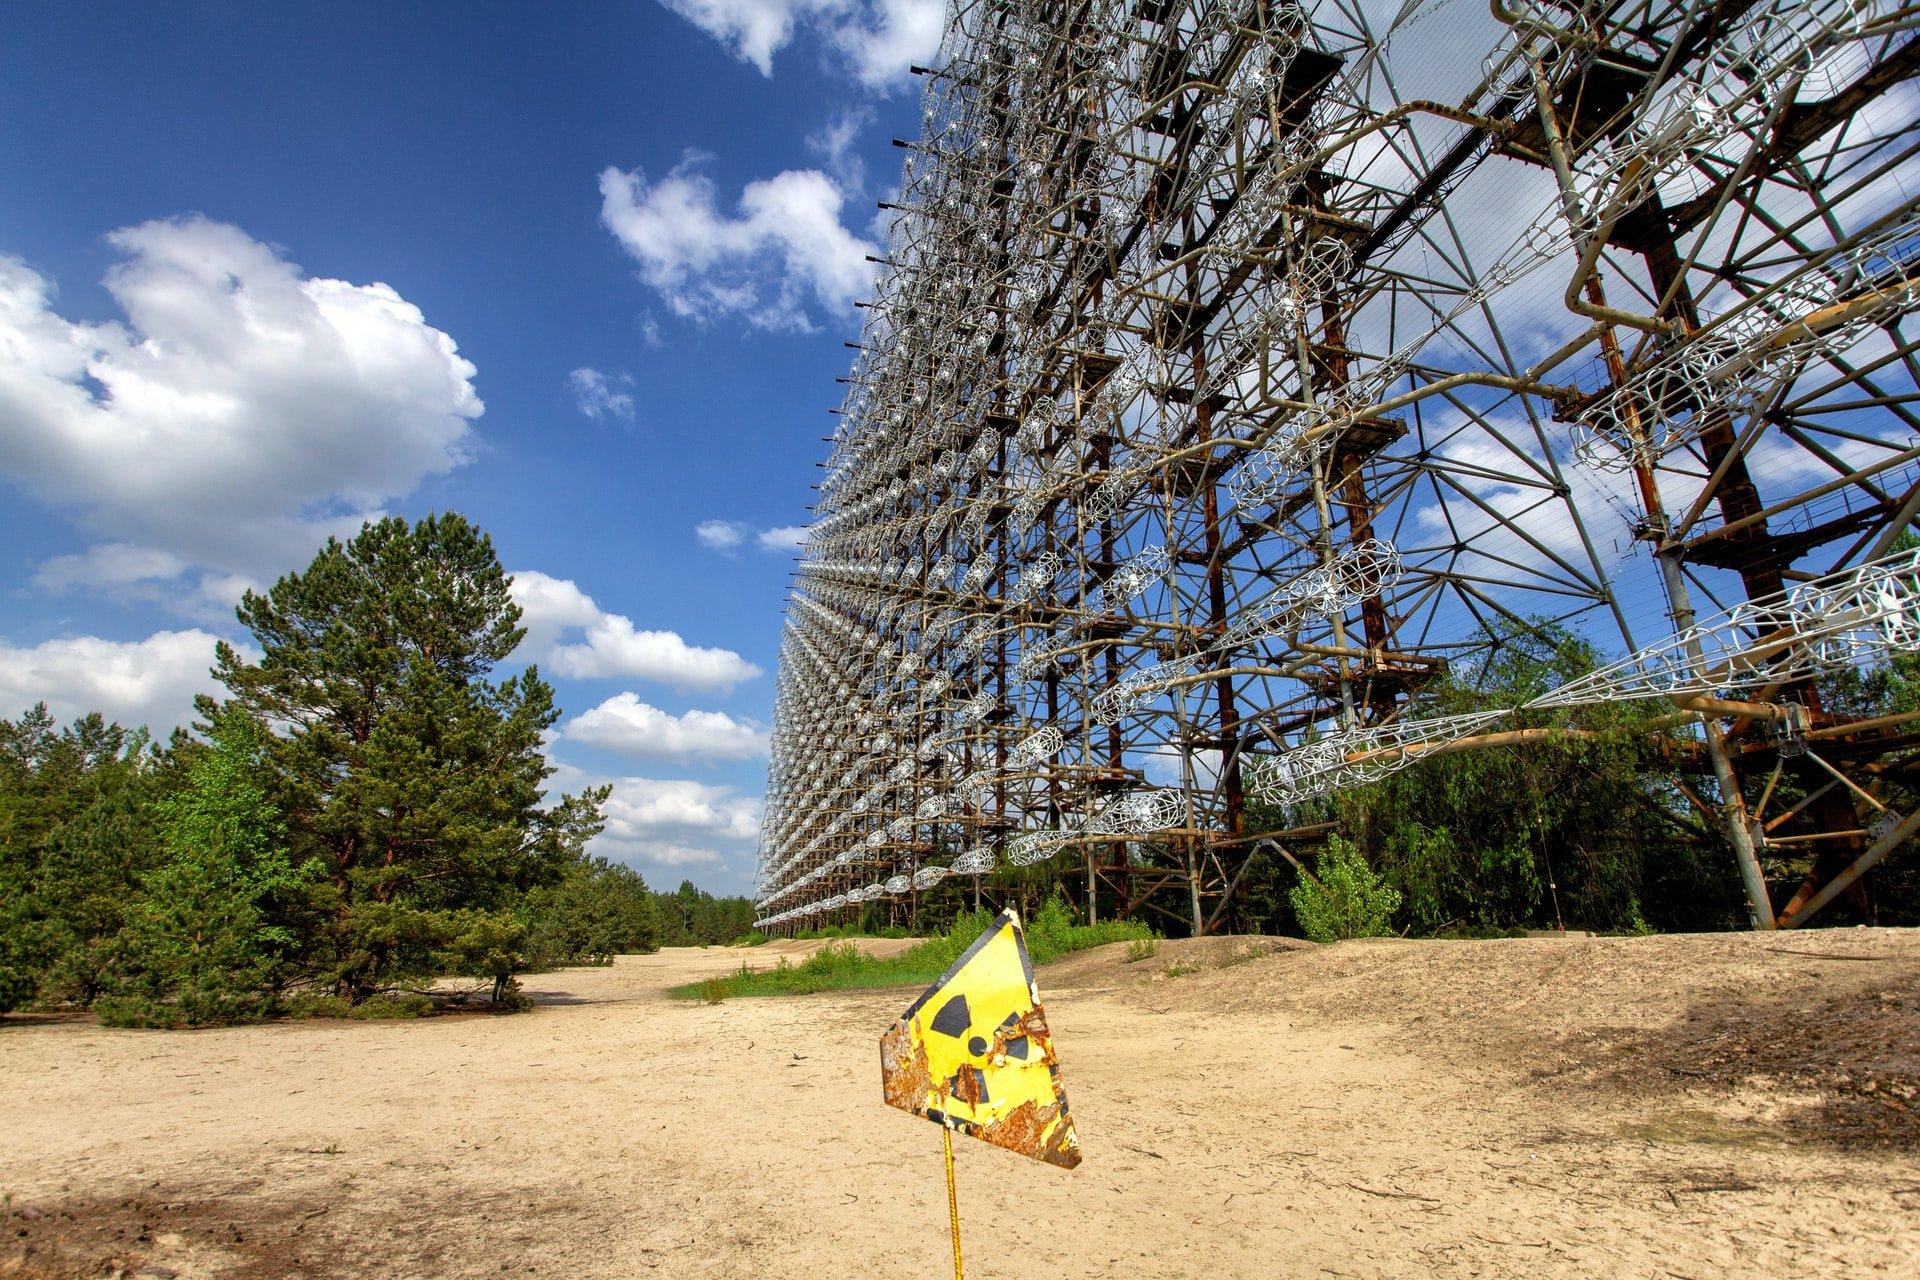 Duga 1 Soviet-era radar (photo: Yves Alarie, Unsplash)